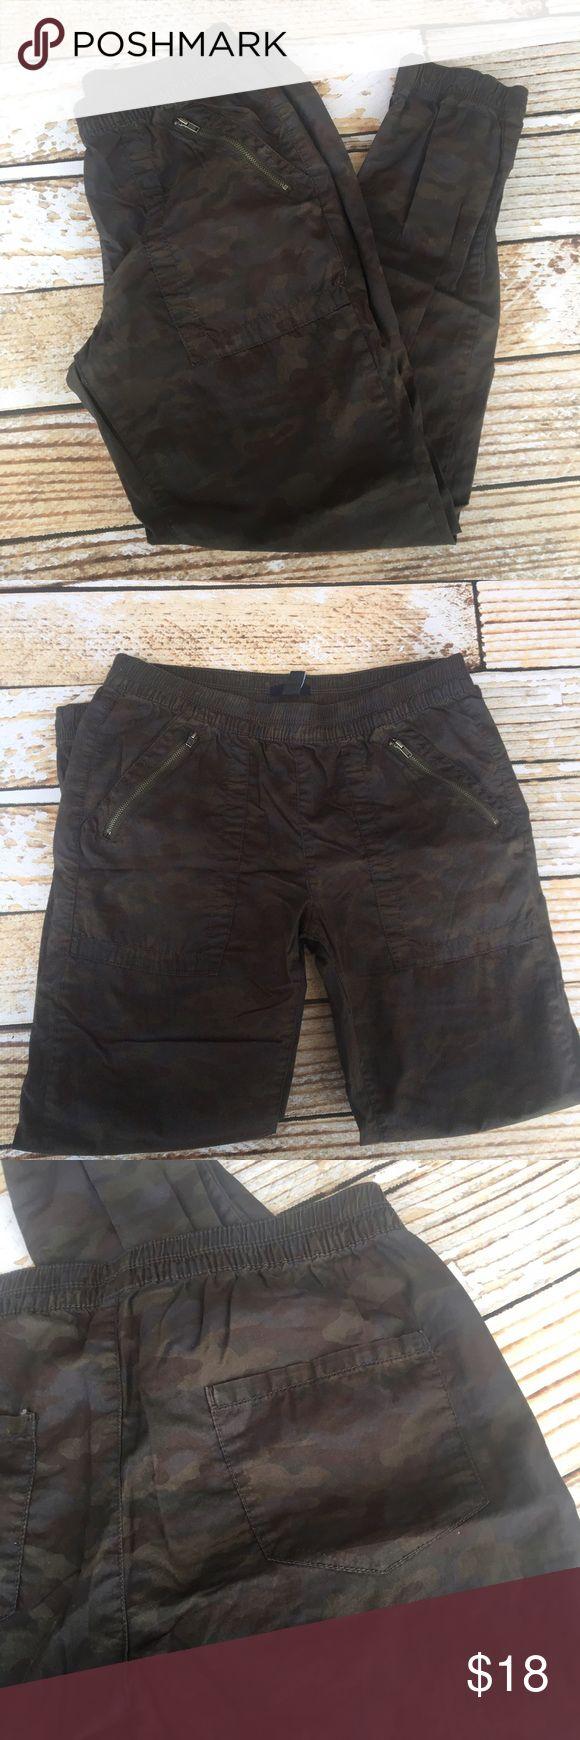 "Gap camo jogger pants size small Gap camo jogger pants size small. I honestly don't know if these are women's or men's. When flat: inseam 27.5"" rise 10"" waist 15.5"" GAP Pants Track Pants & Joggers"